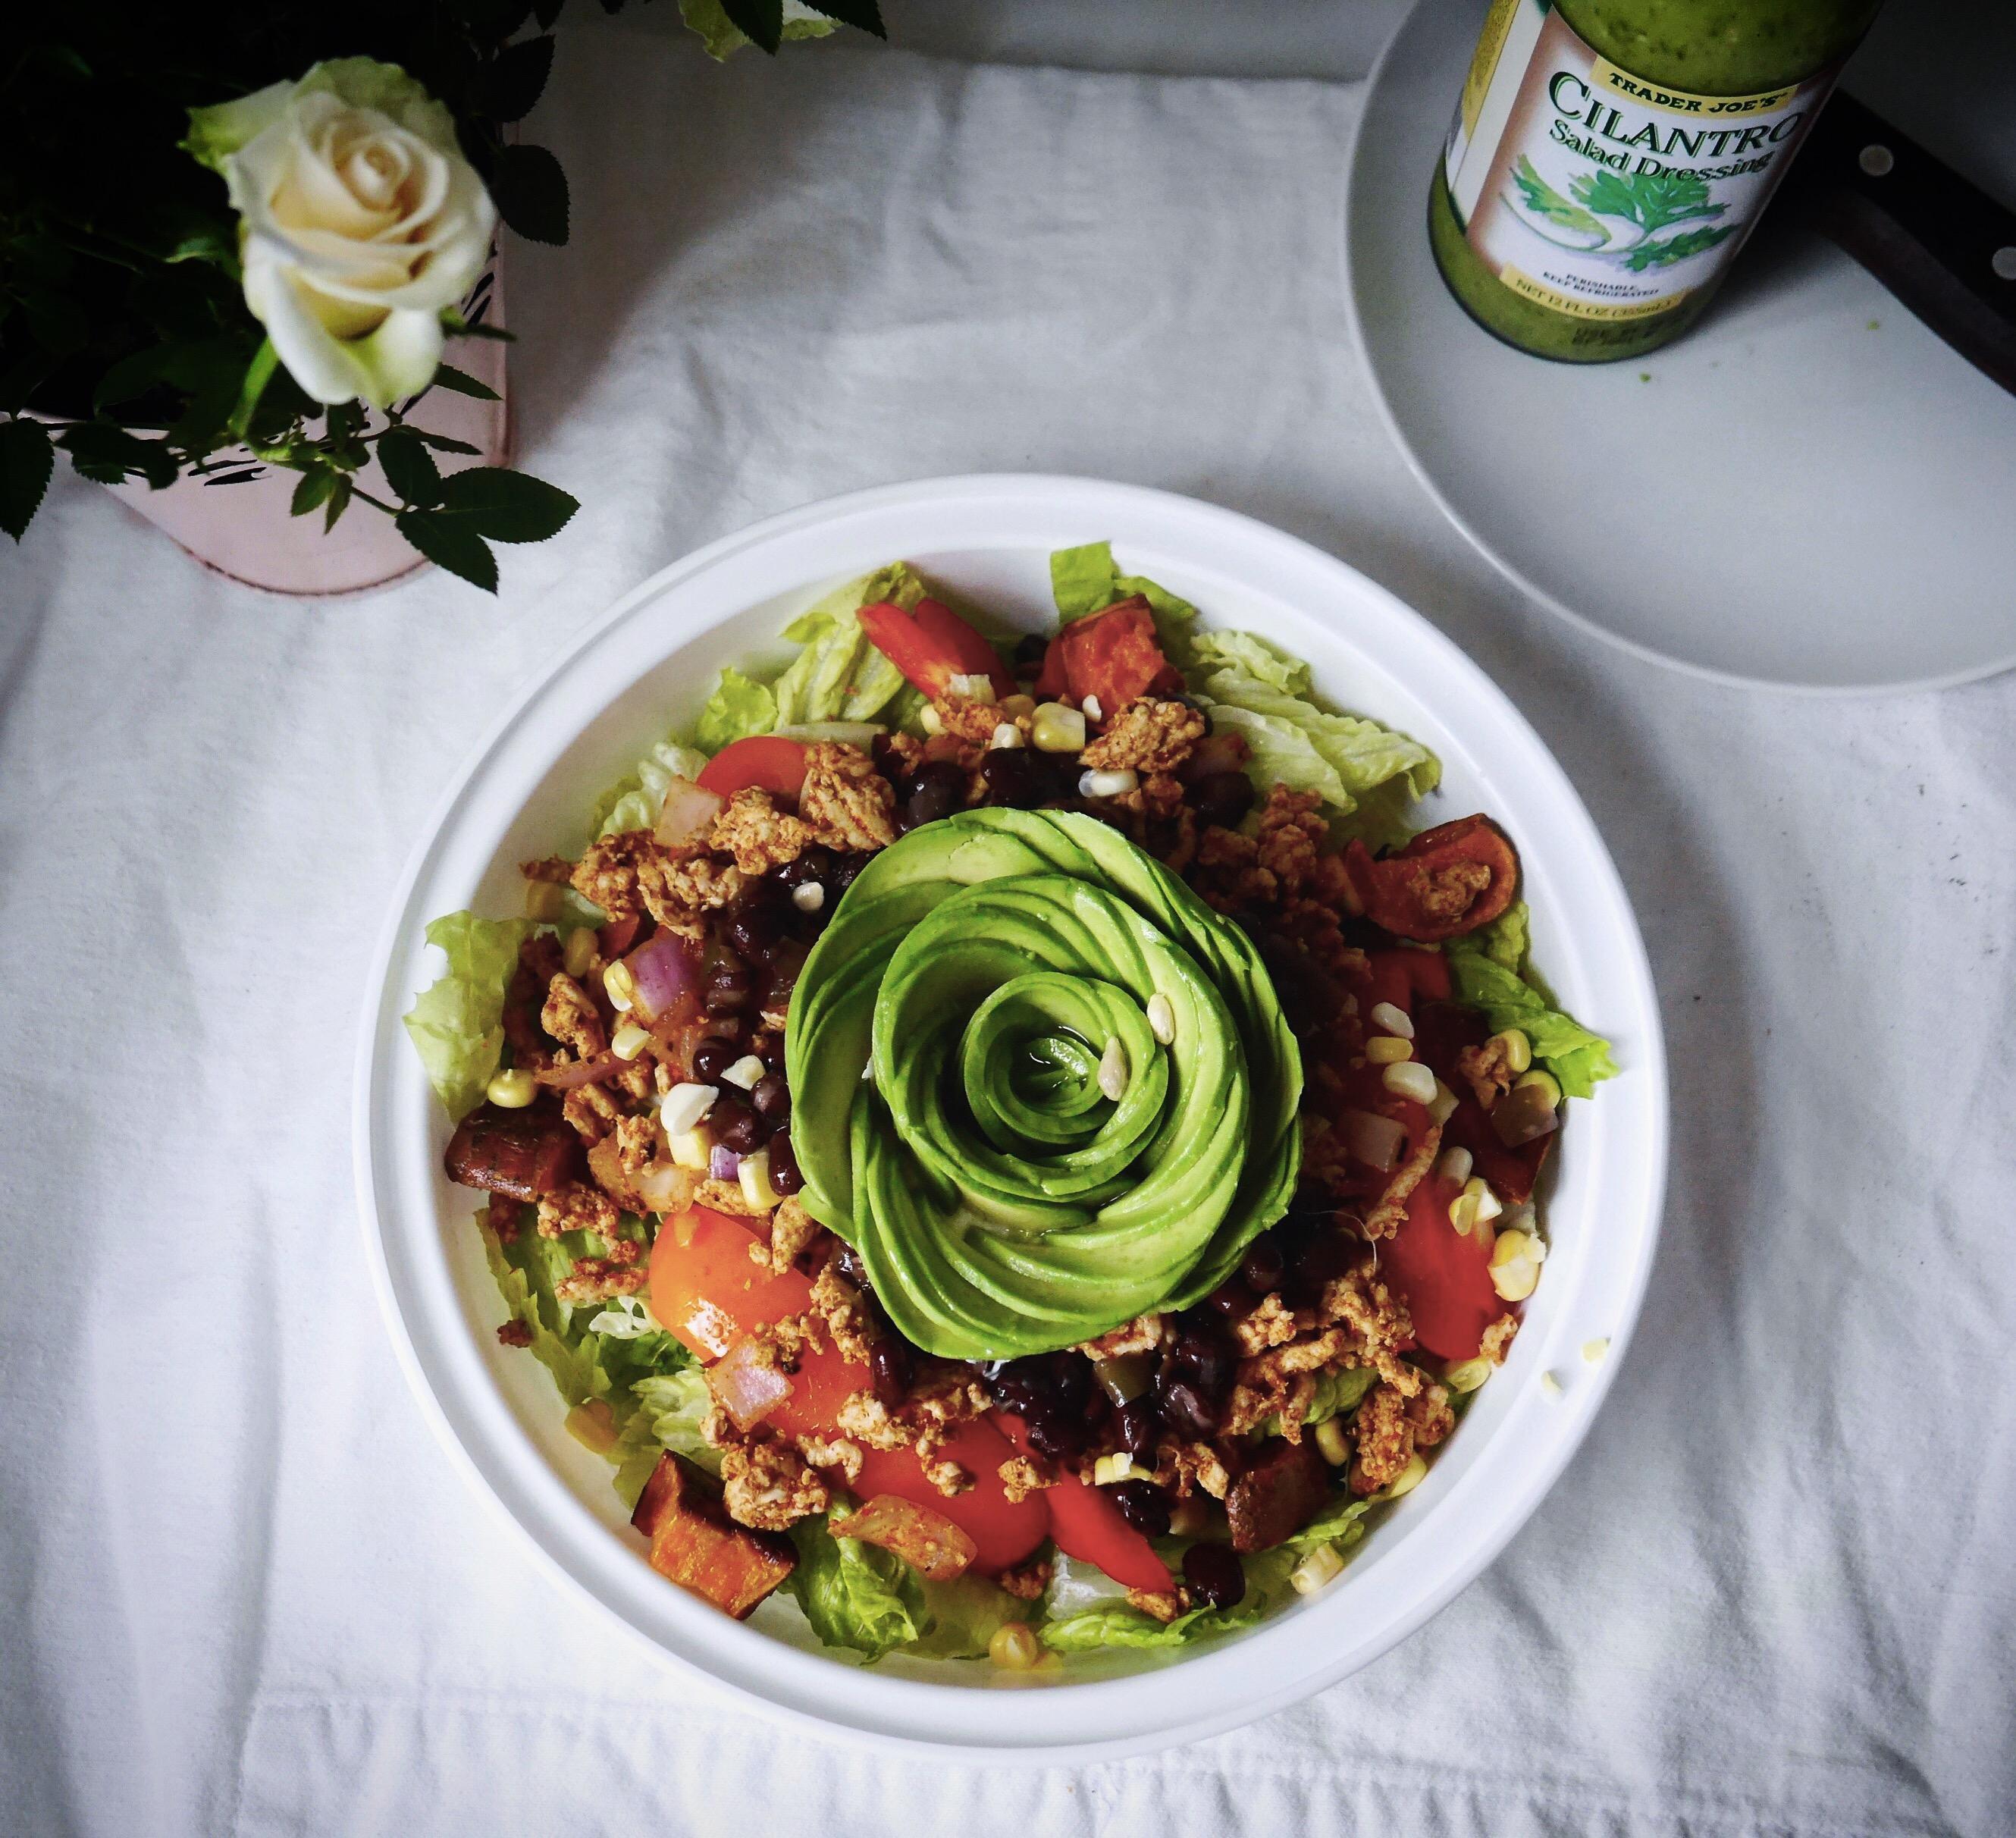 Taco salad with avocado rose